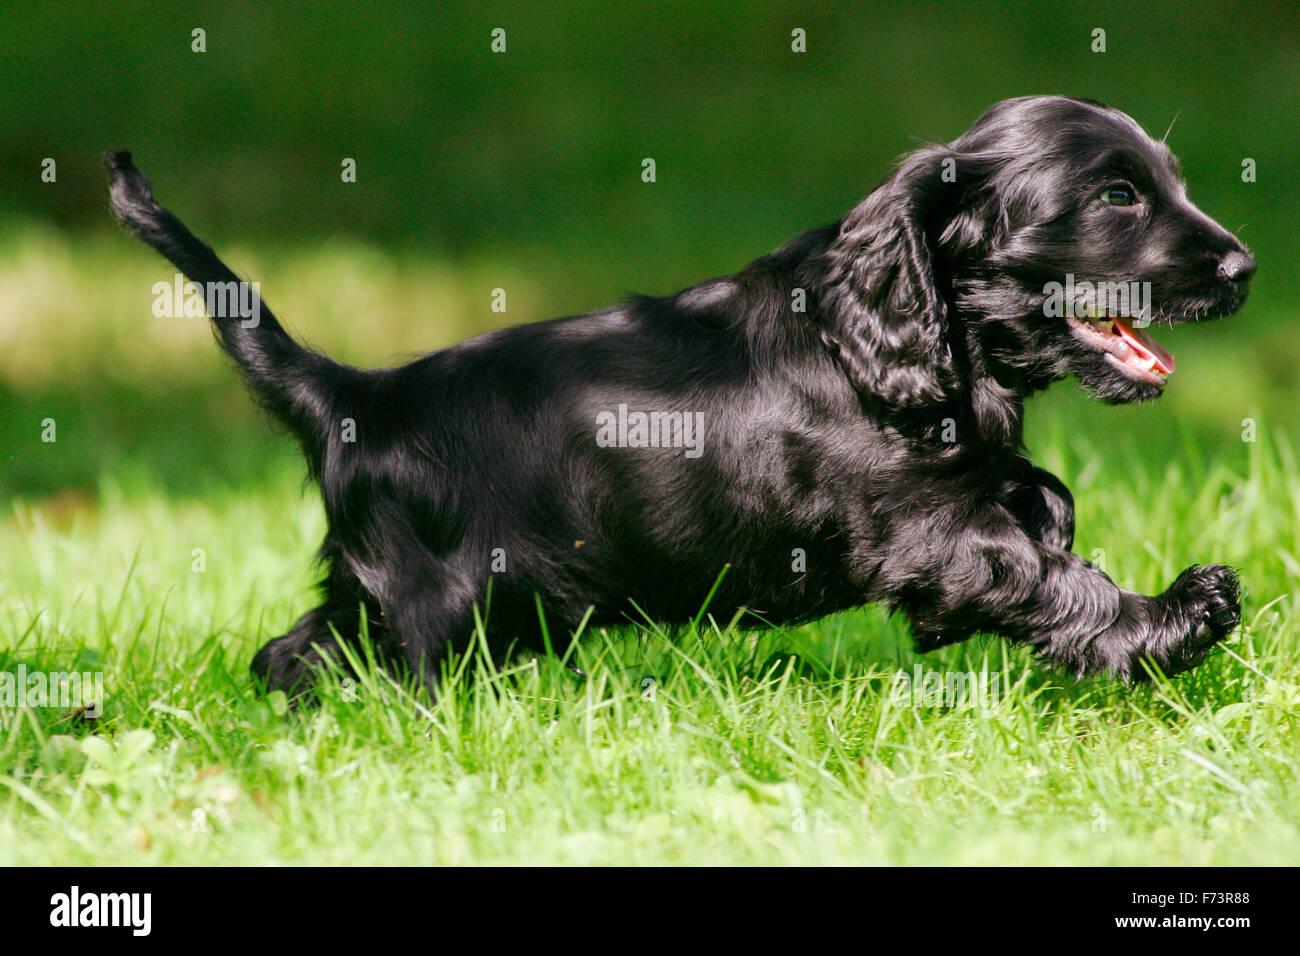 english cocker spaniel black puppy running on a lawn